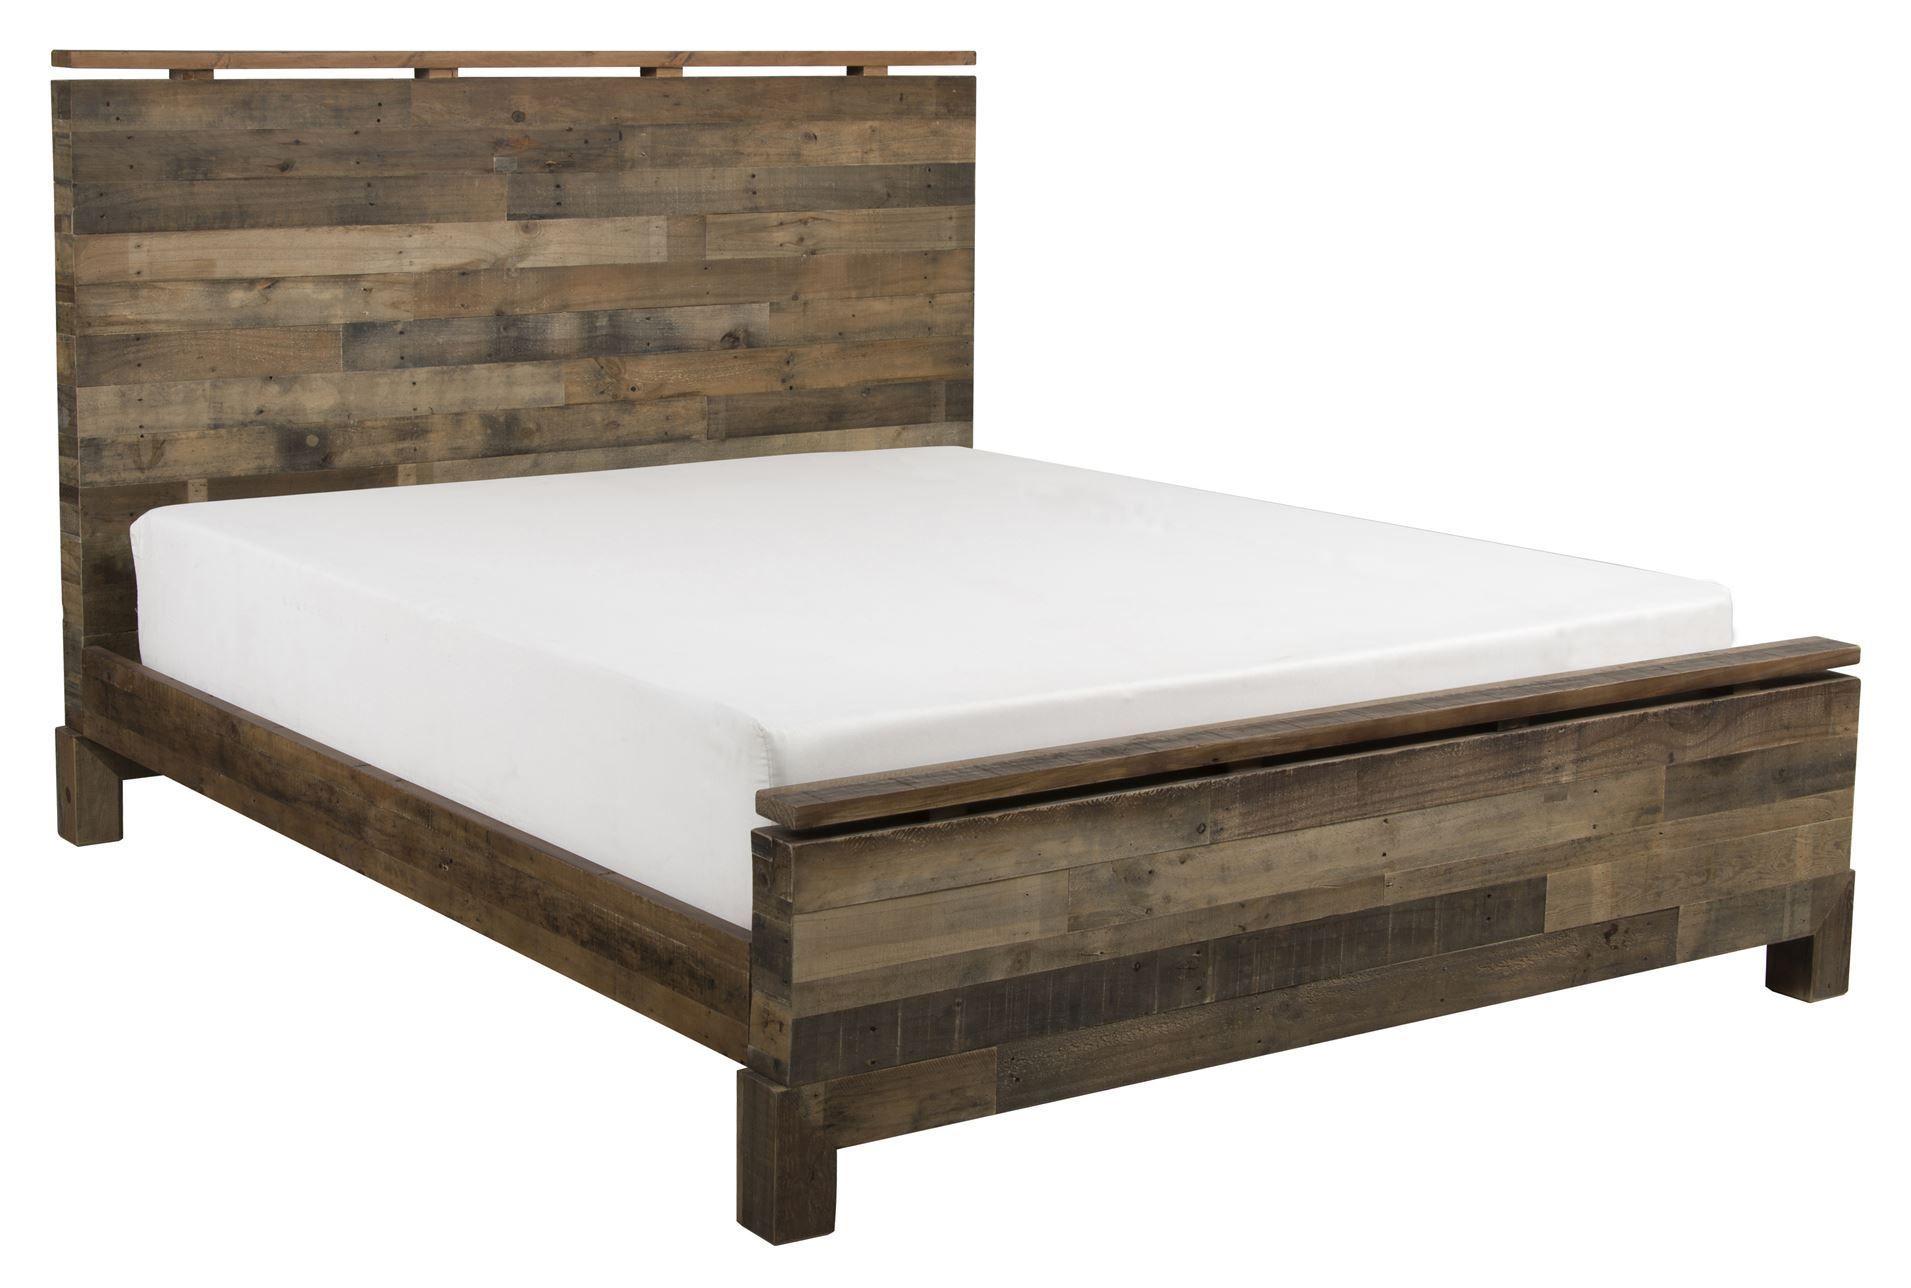 Bedroom Sets Living Spaces atticus california king platform bed | king platform bed, platform